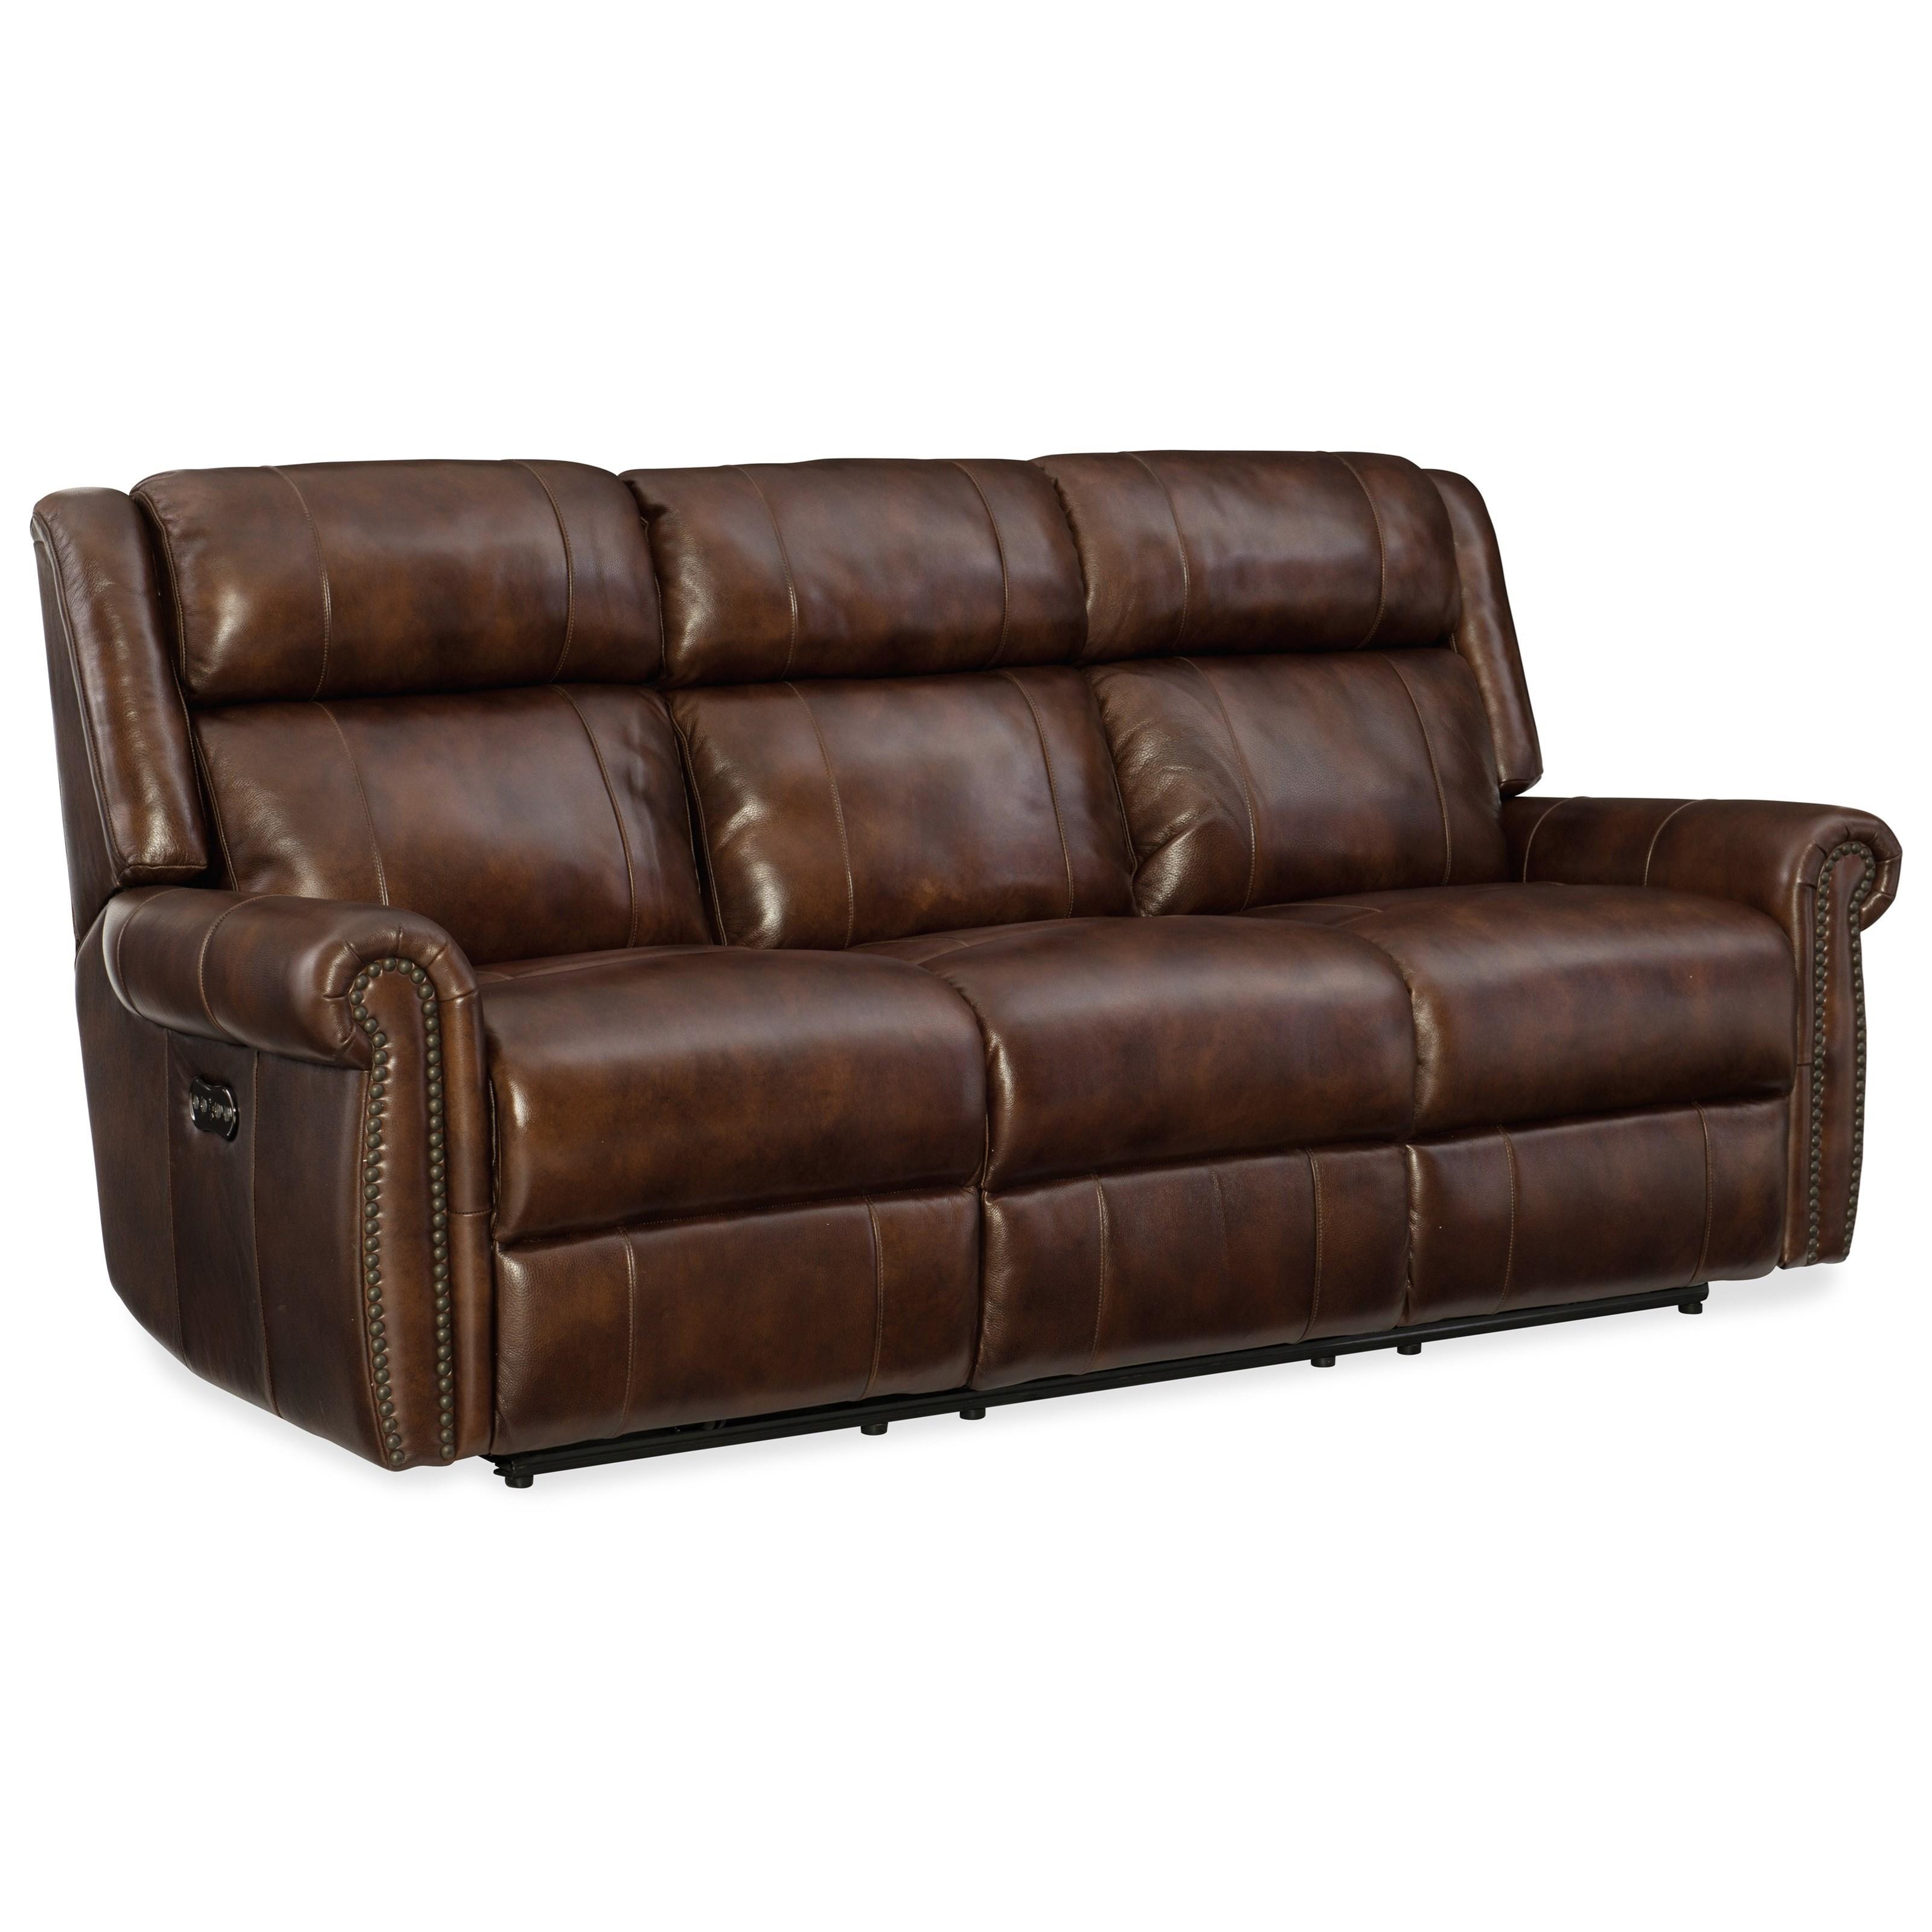 Hooker Furniture Esme Power Motion Sofa With Power Headrest